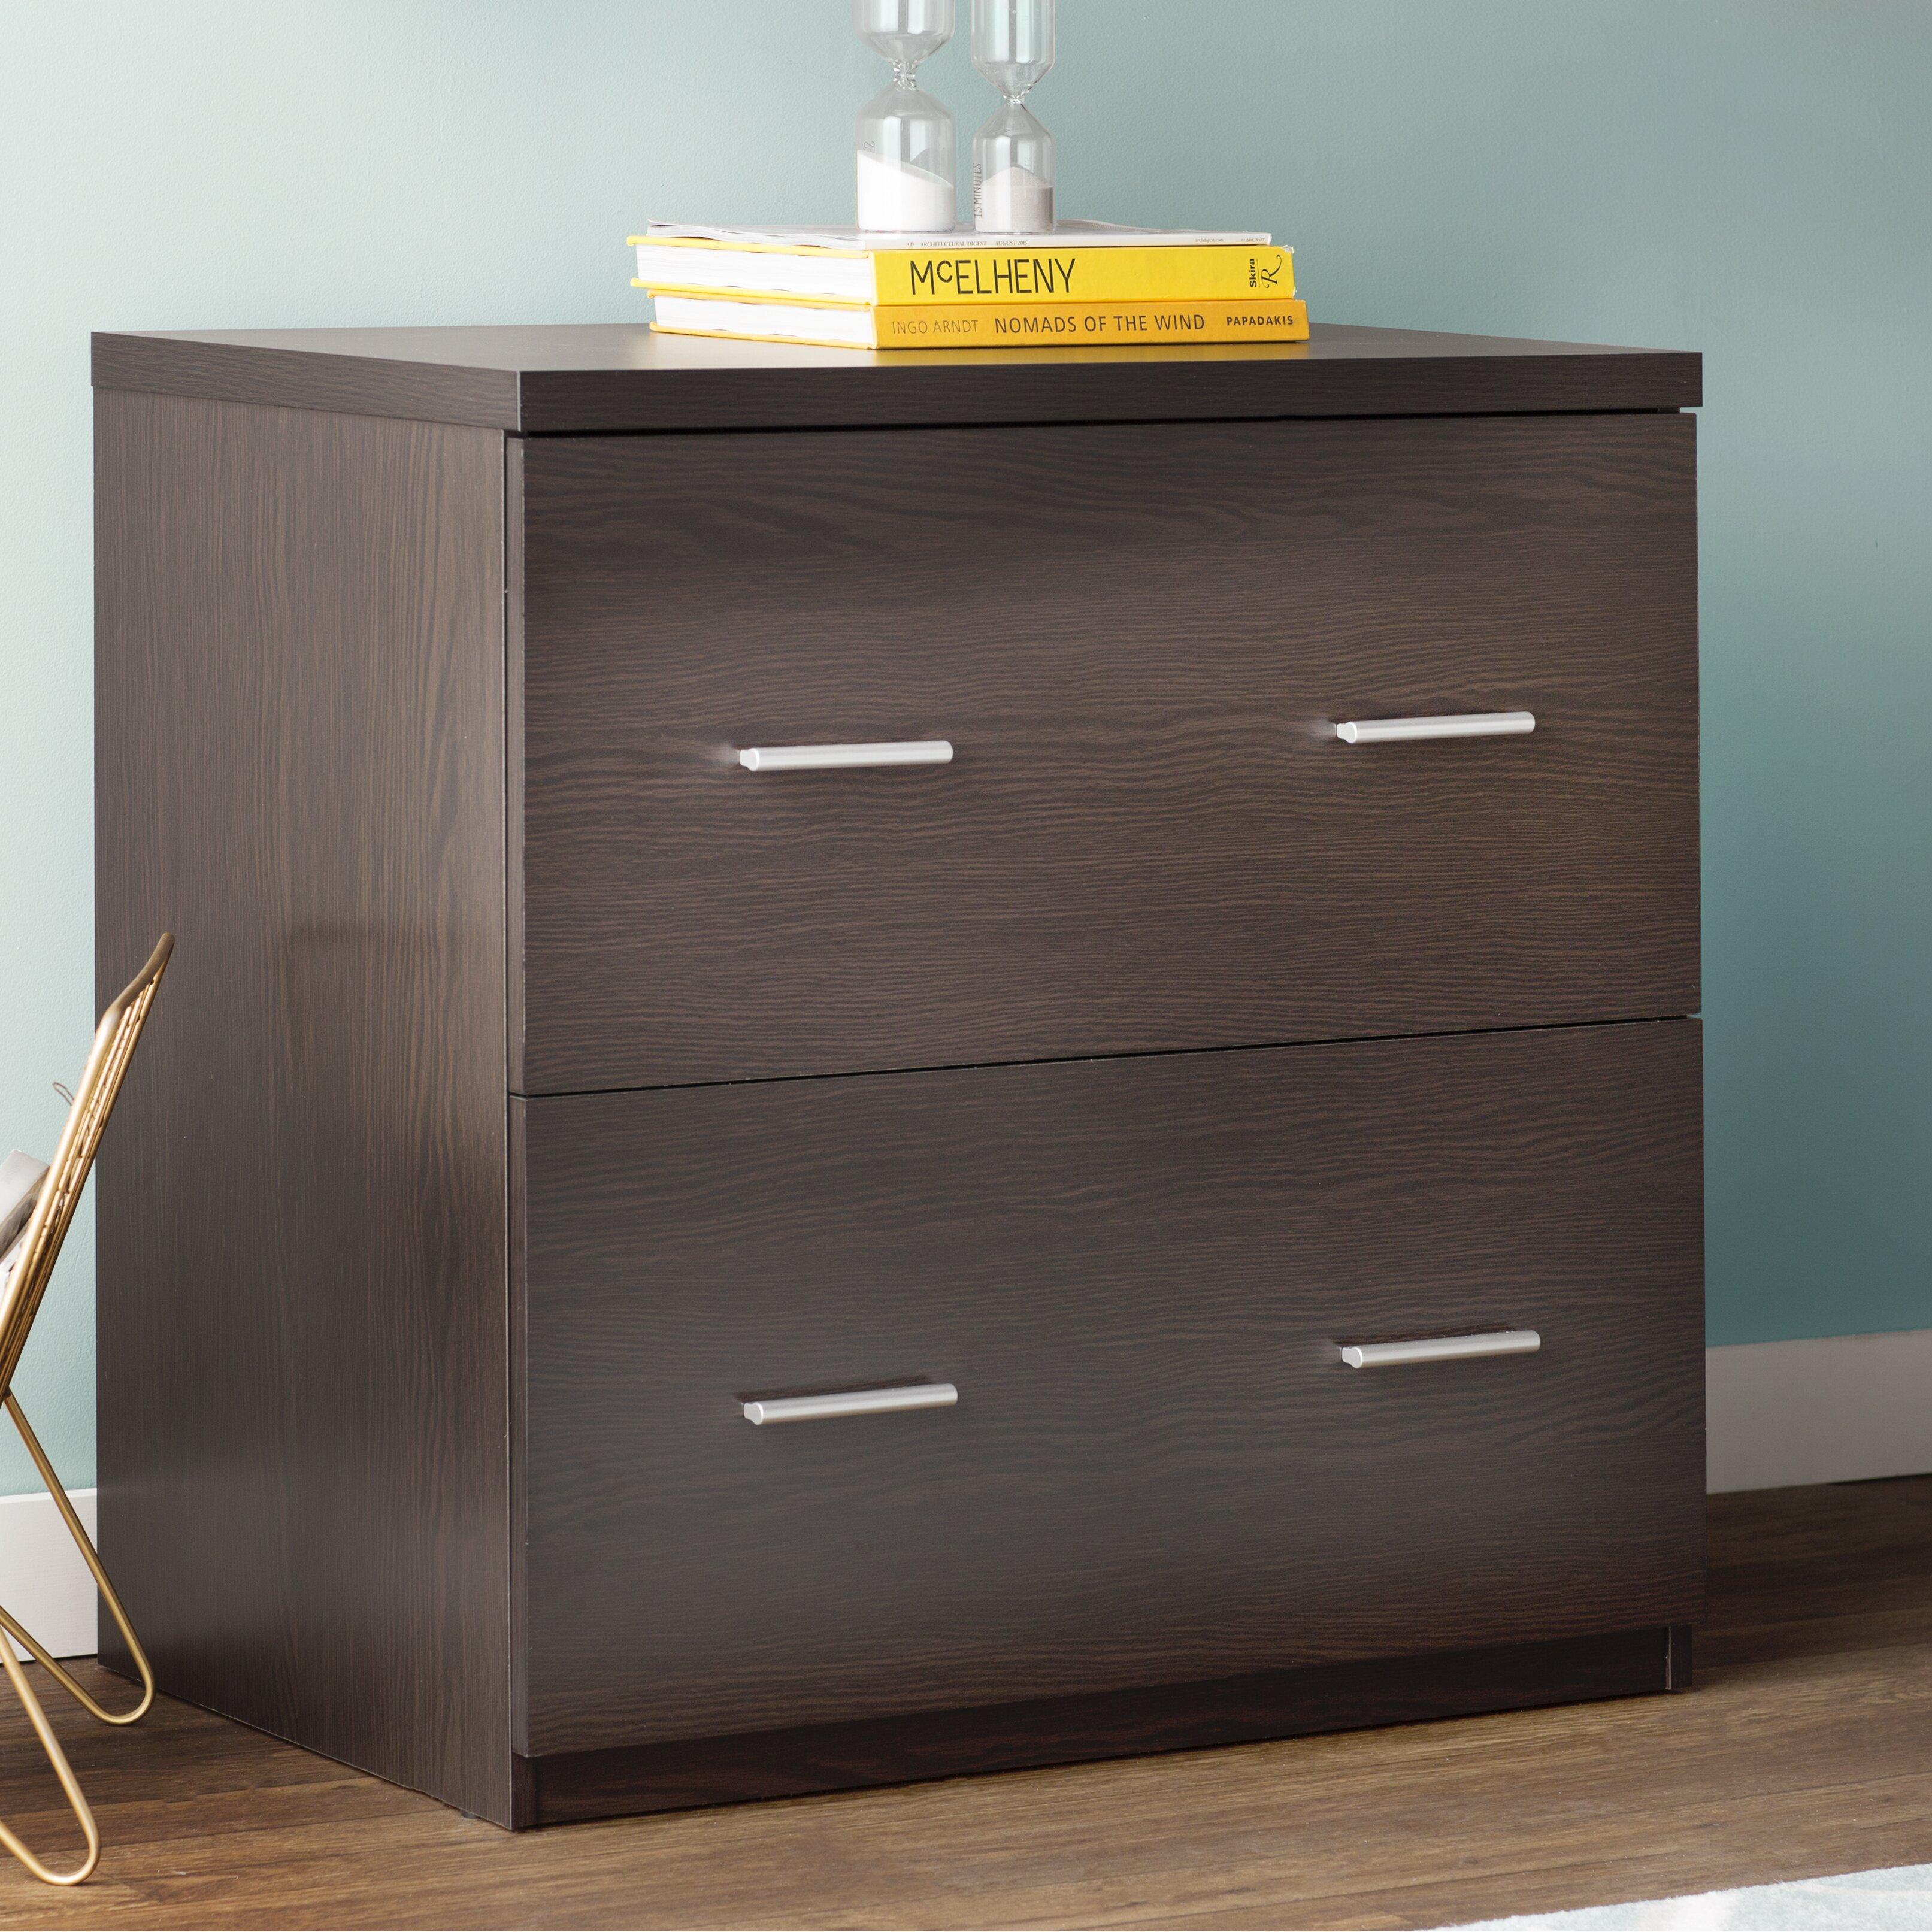 latitude run magdalena 2 drawer lateral file cabinet. Black Bedroom Furniture Sets. Home Design Ideas